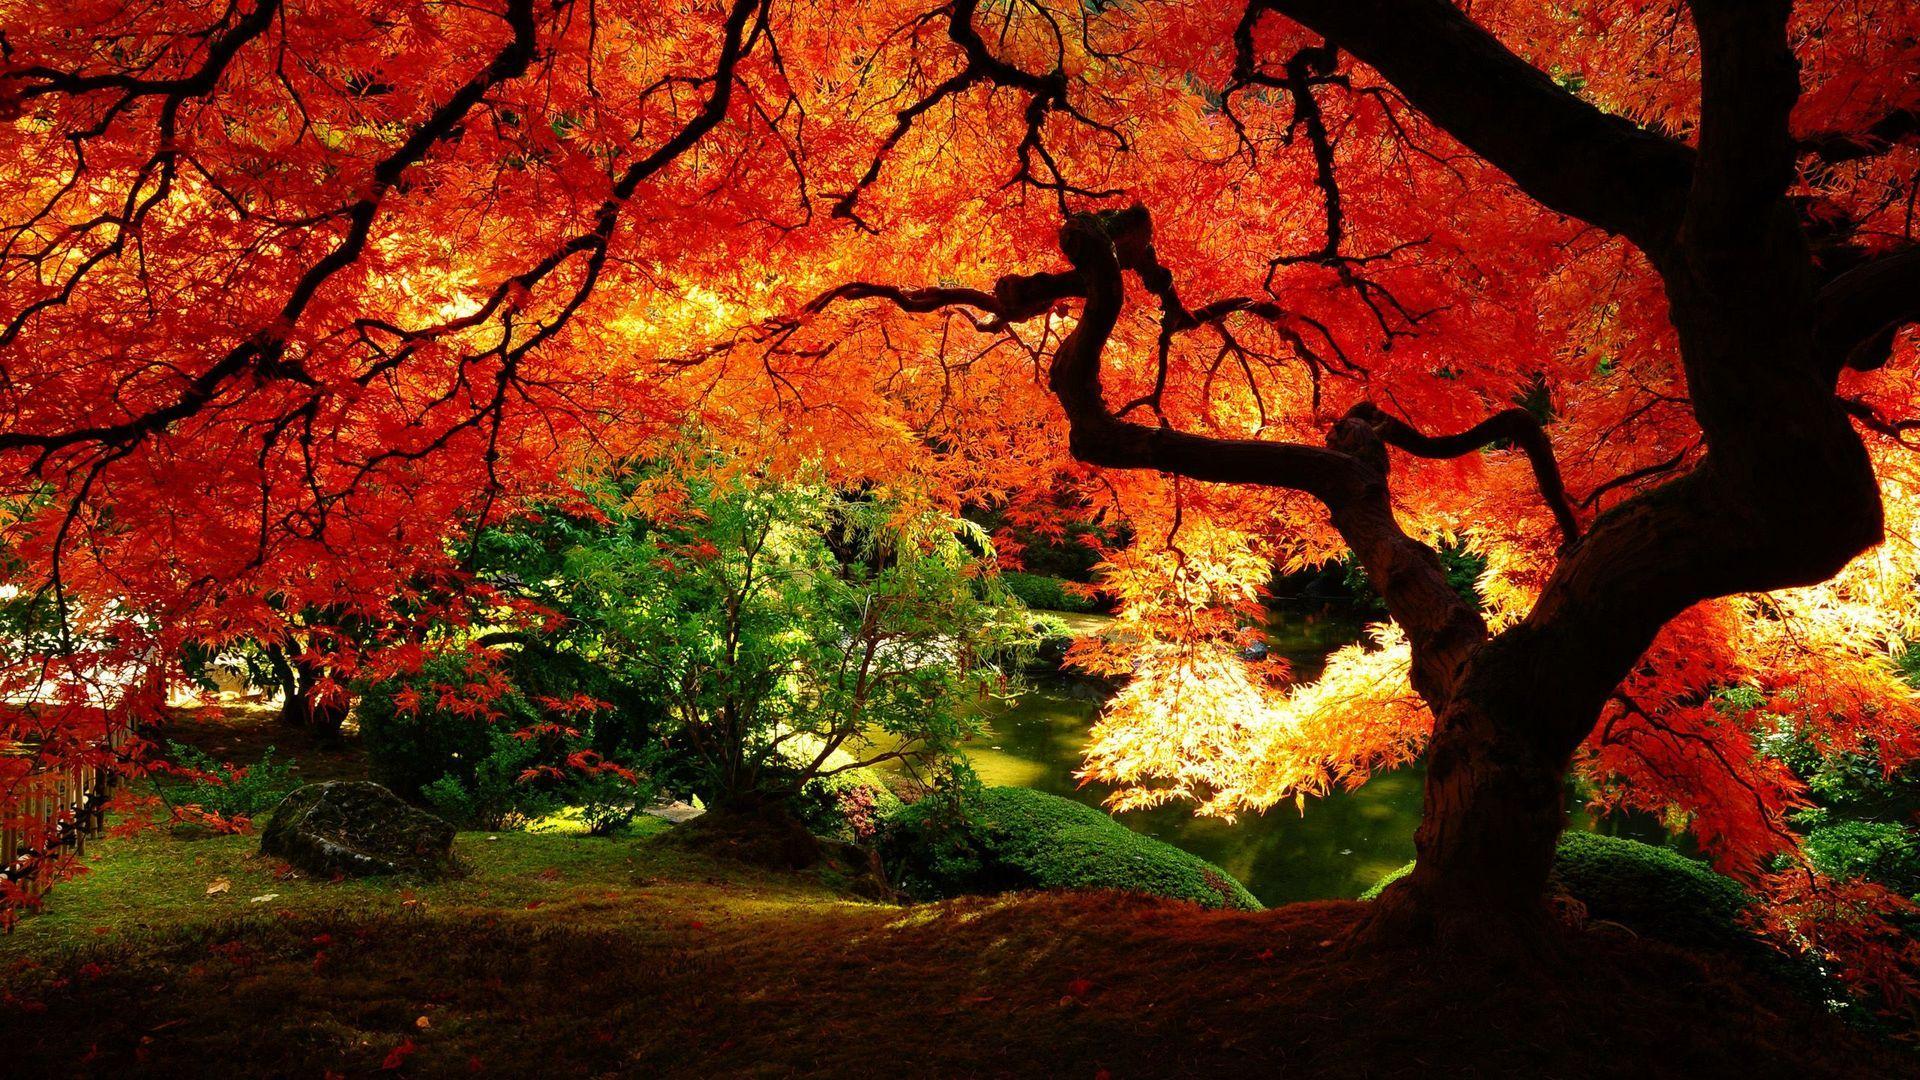 Tree Wallpaper Wide Xeg Autumn Landscape Desktop Wallpaper Fall Autumn Trees